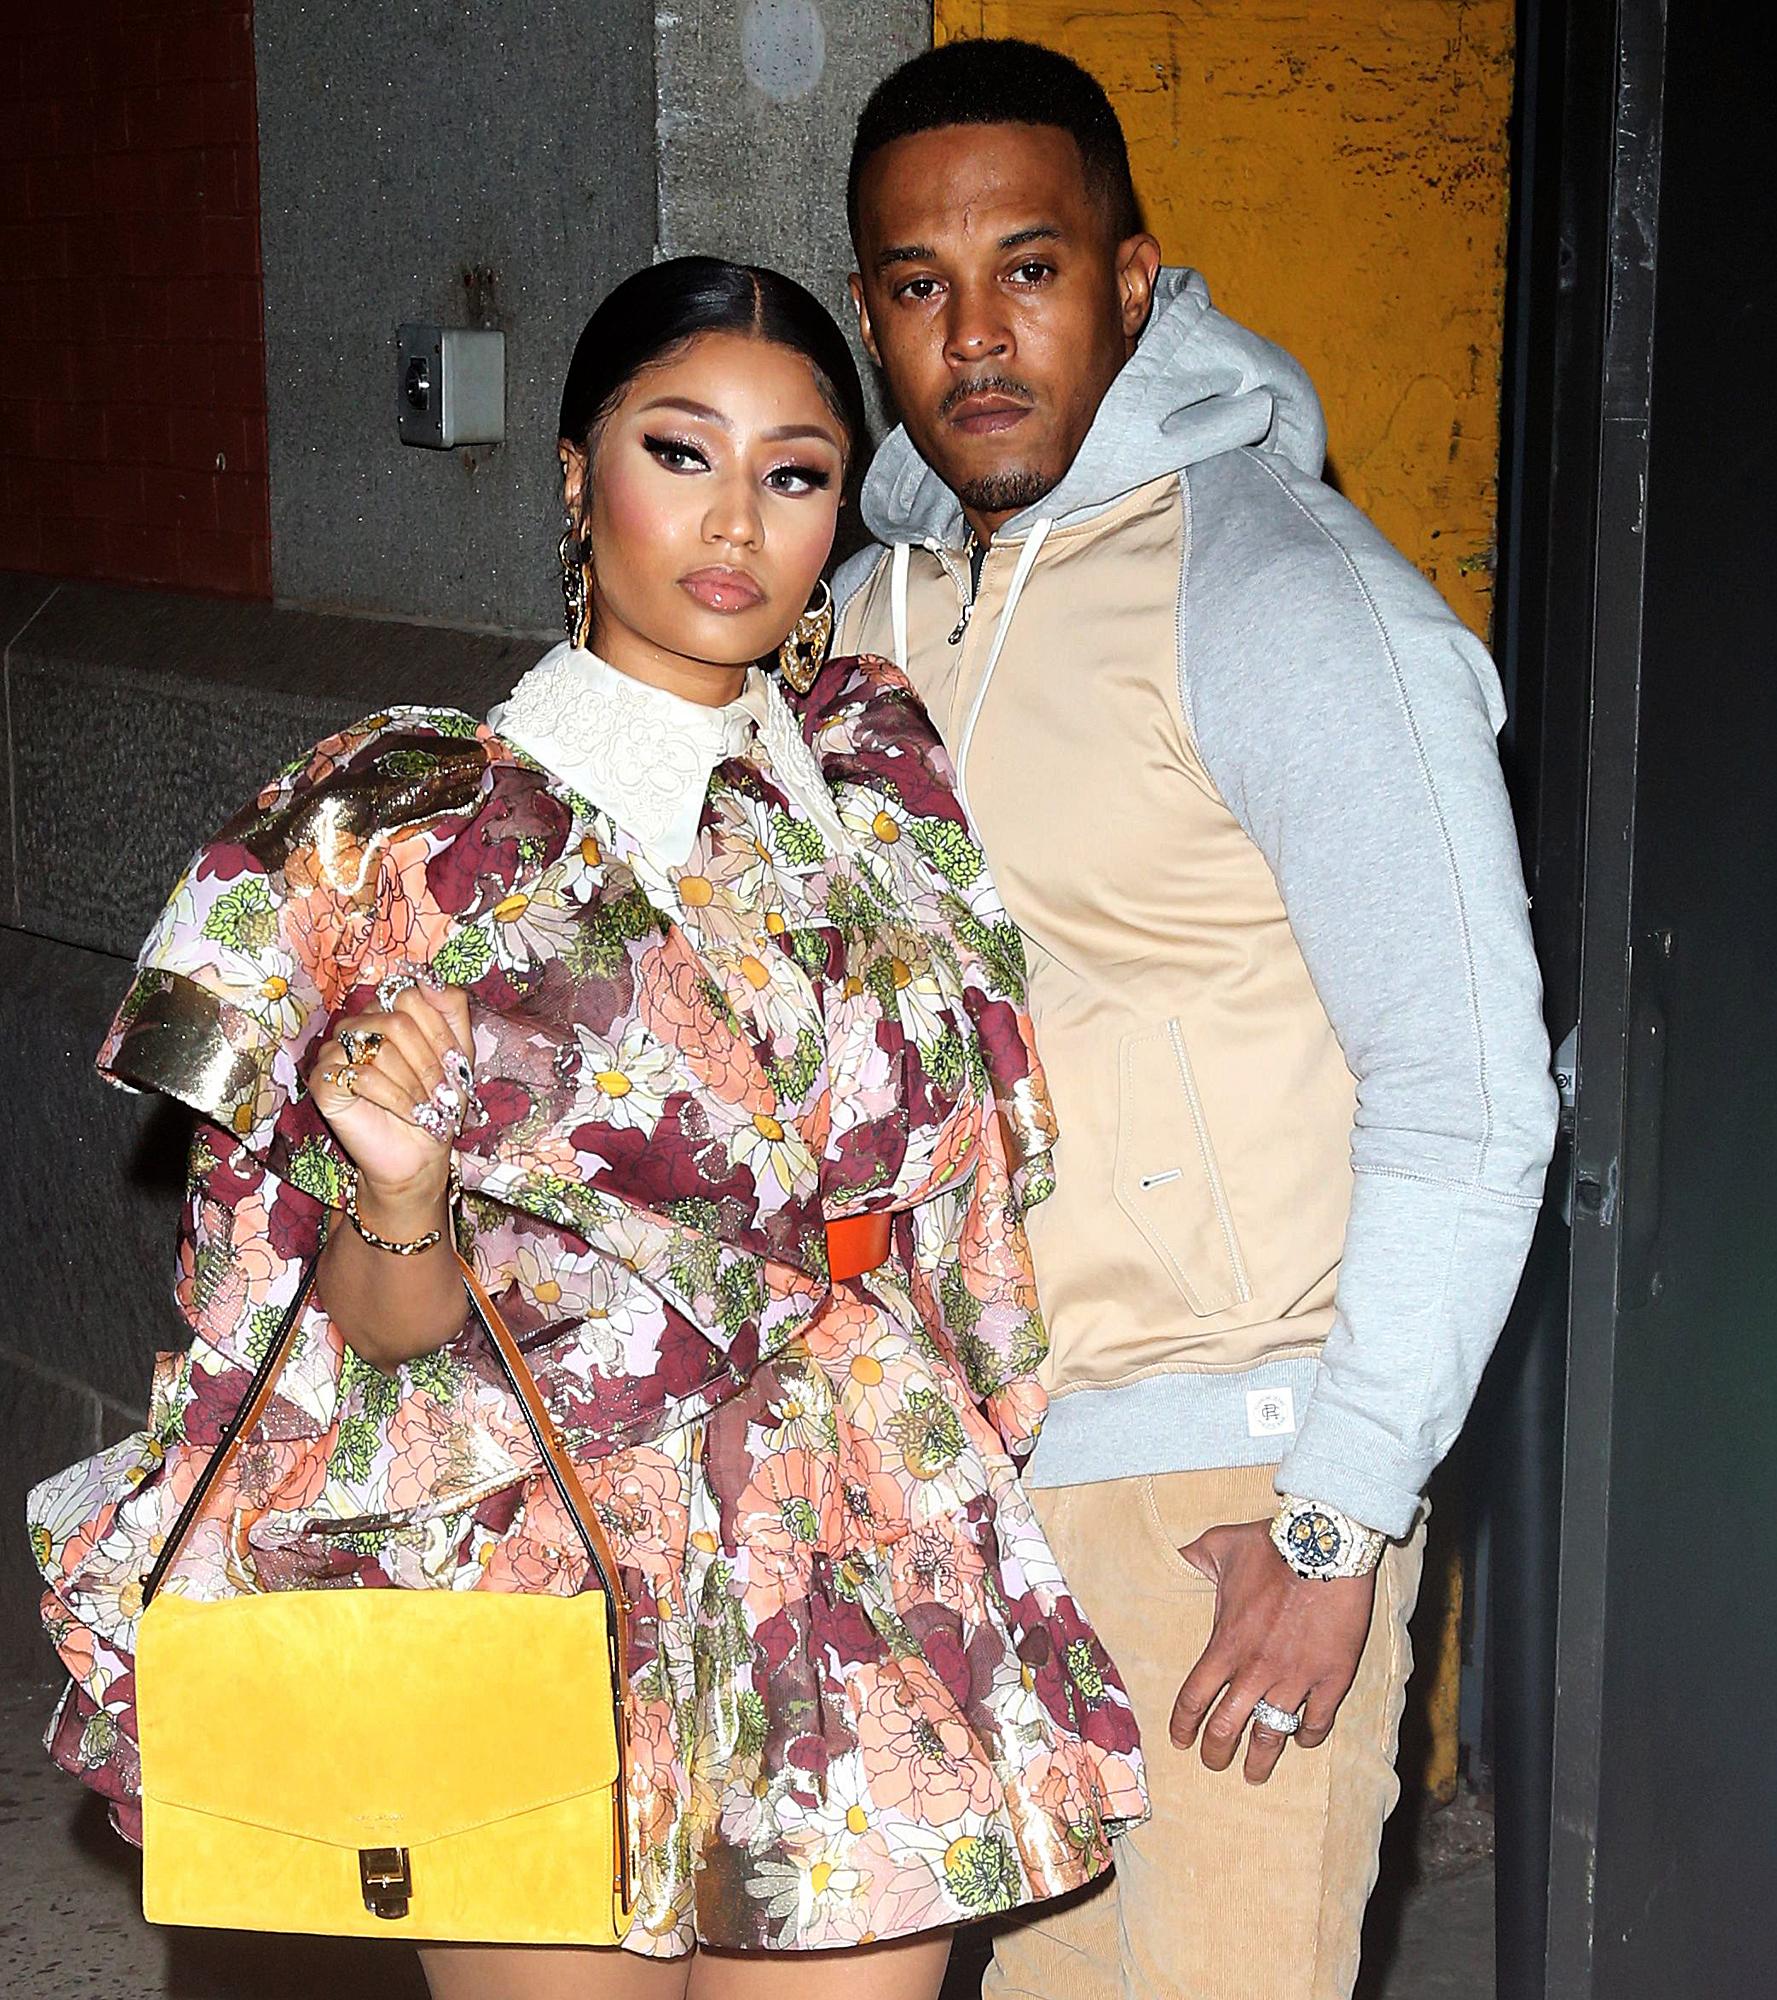 Nicki-Minaj's-Husband-Kenneth-'Zoo'-Petty-Was-Arrested,-Indicted